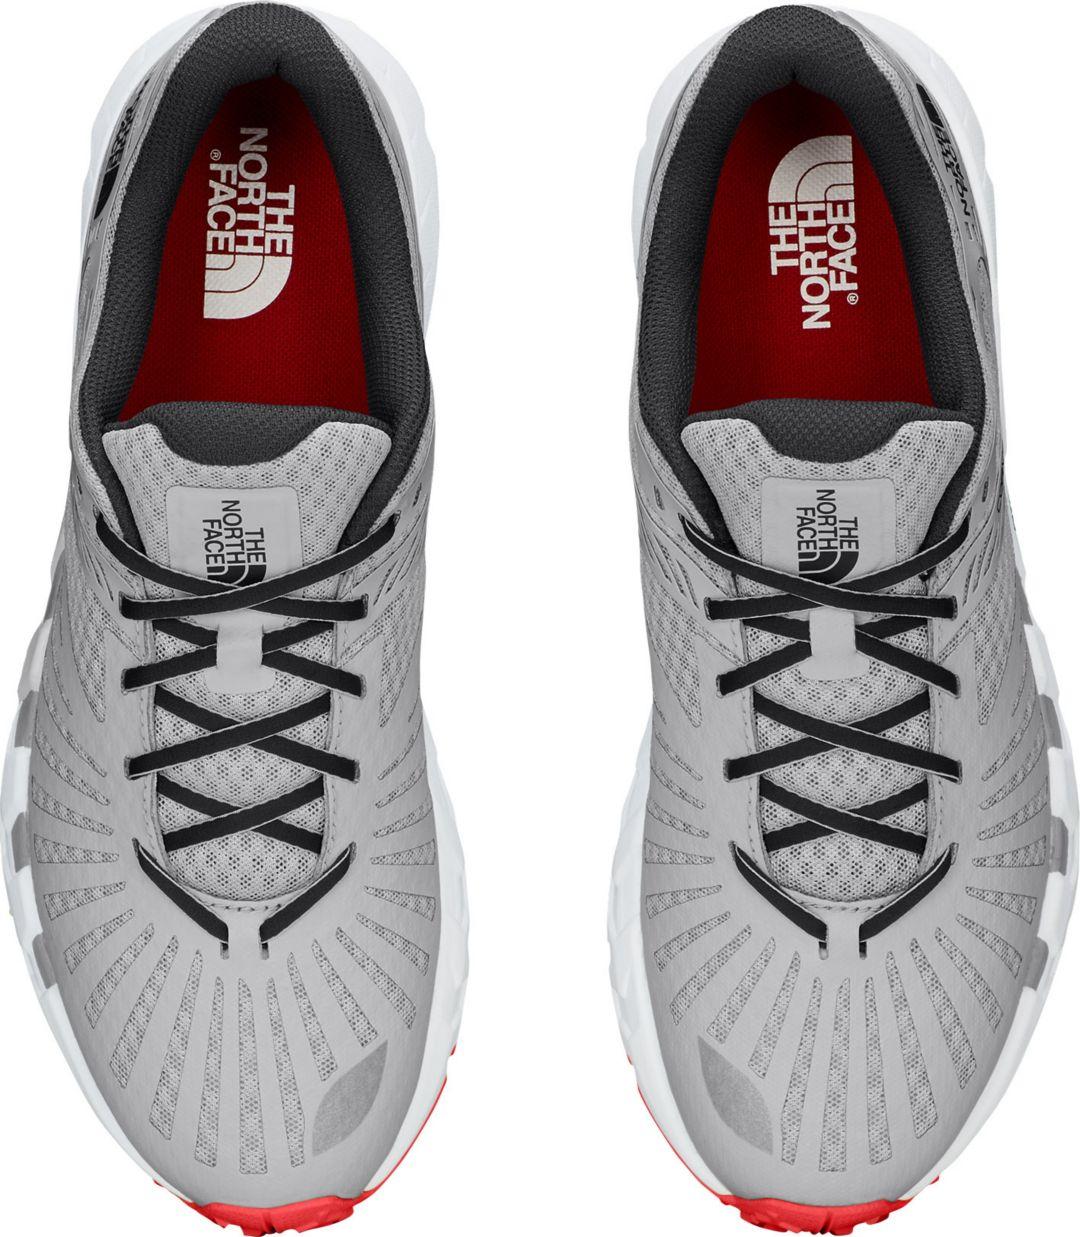 18b8b23c6 The North Face Women's Corvara Trail Running Shoes